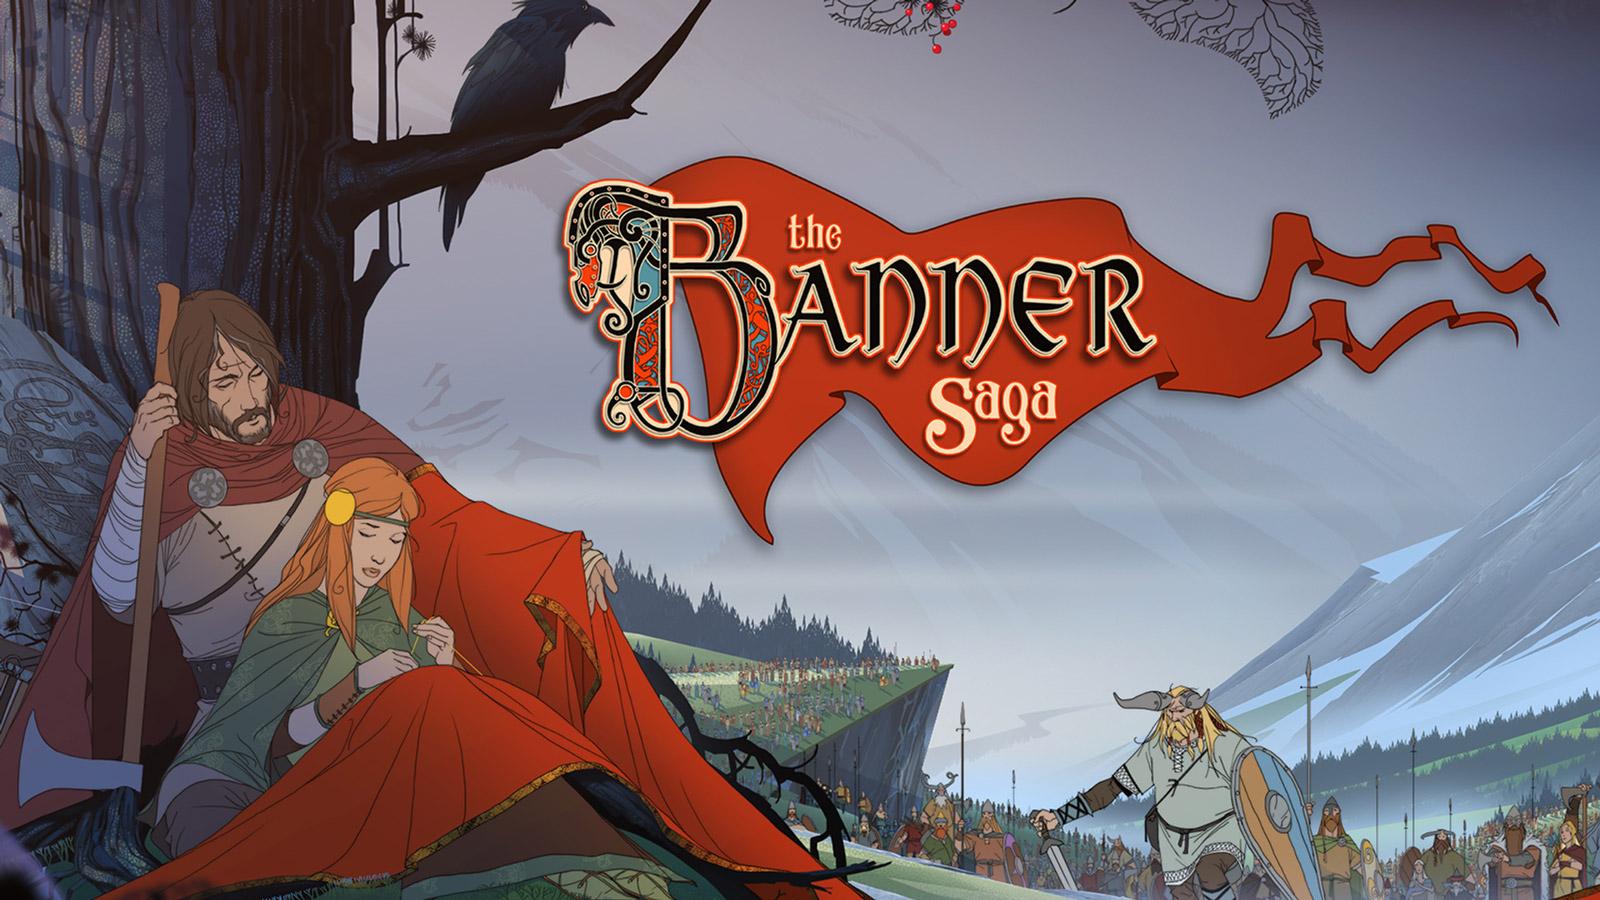 Free The Banner Saga Wallpaper in 1600x900